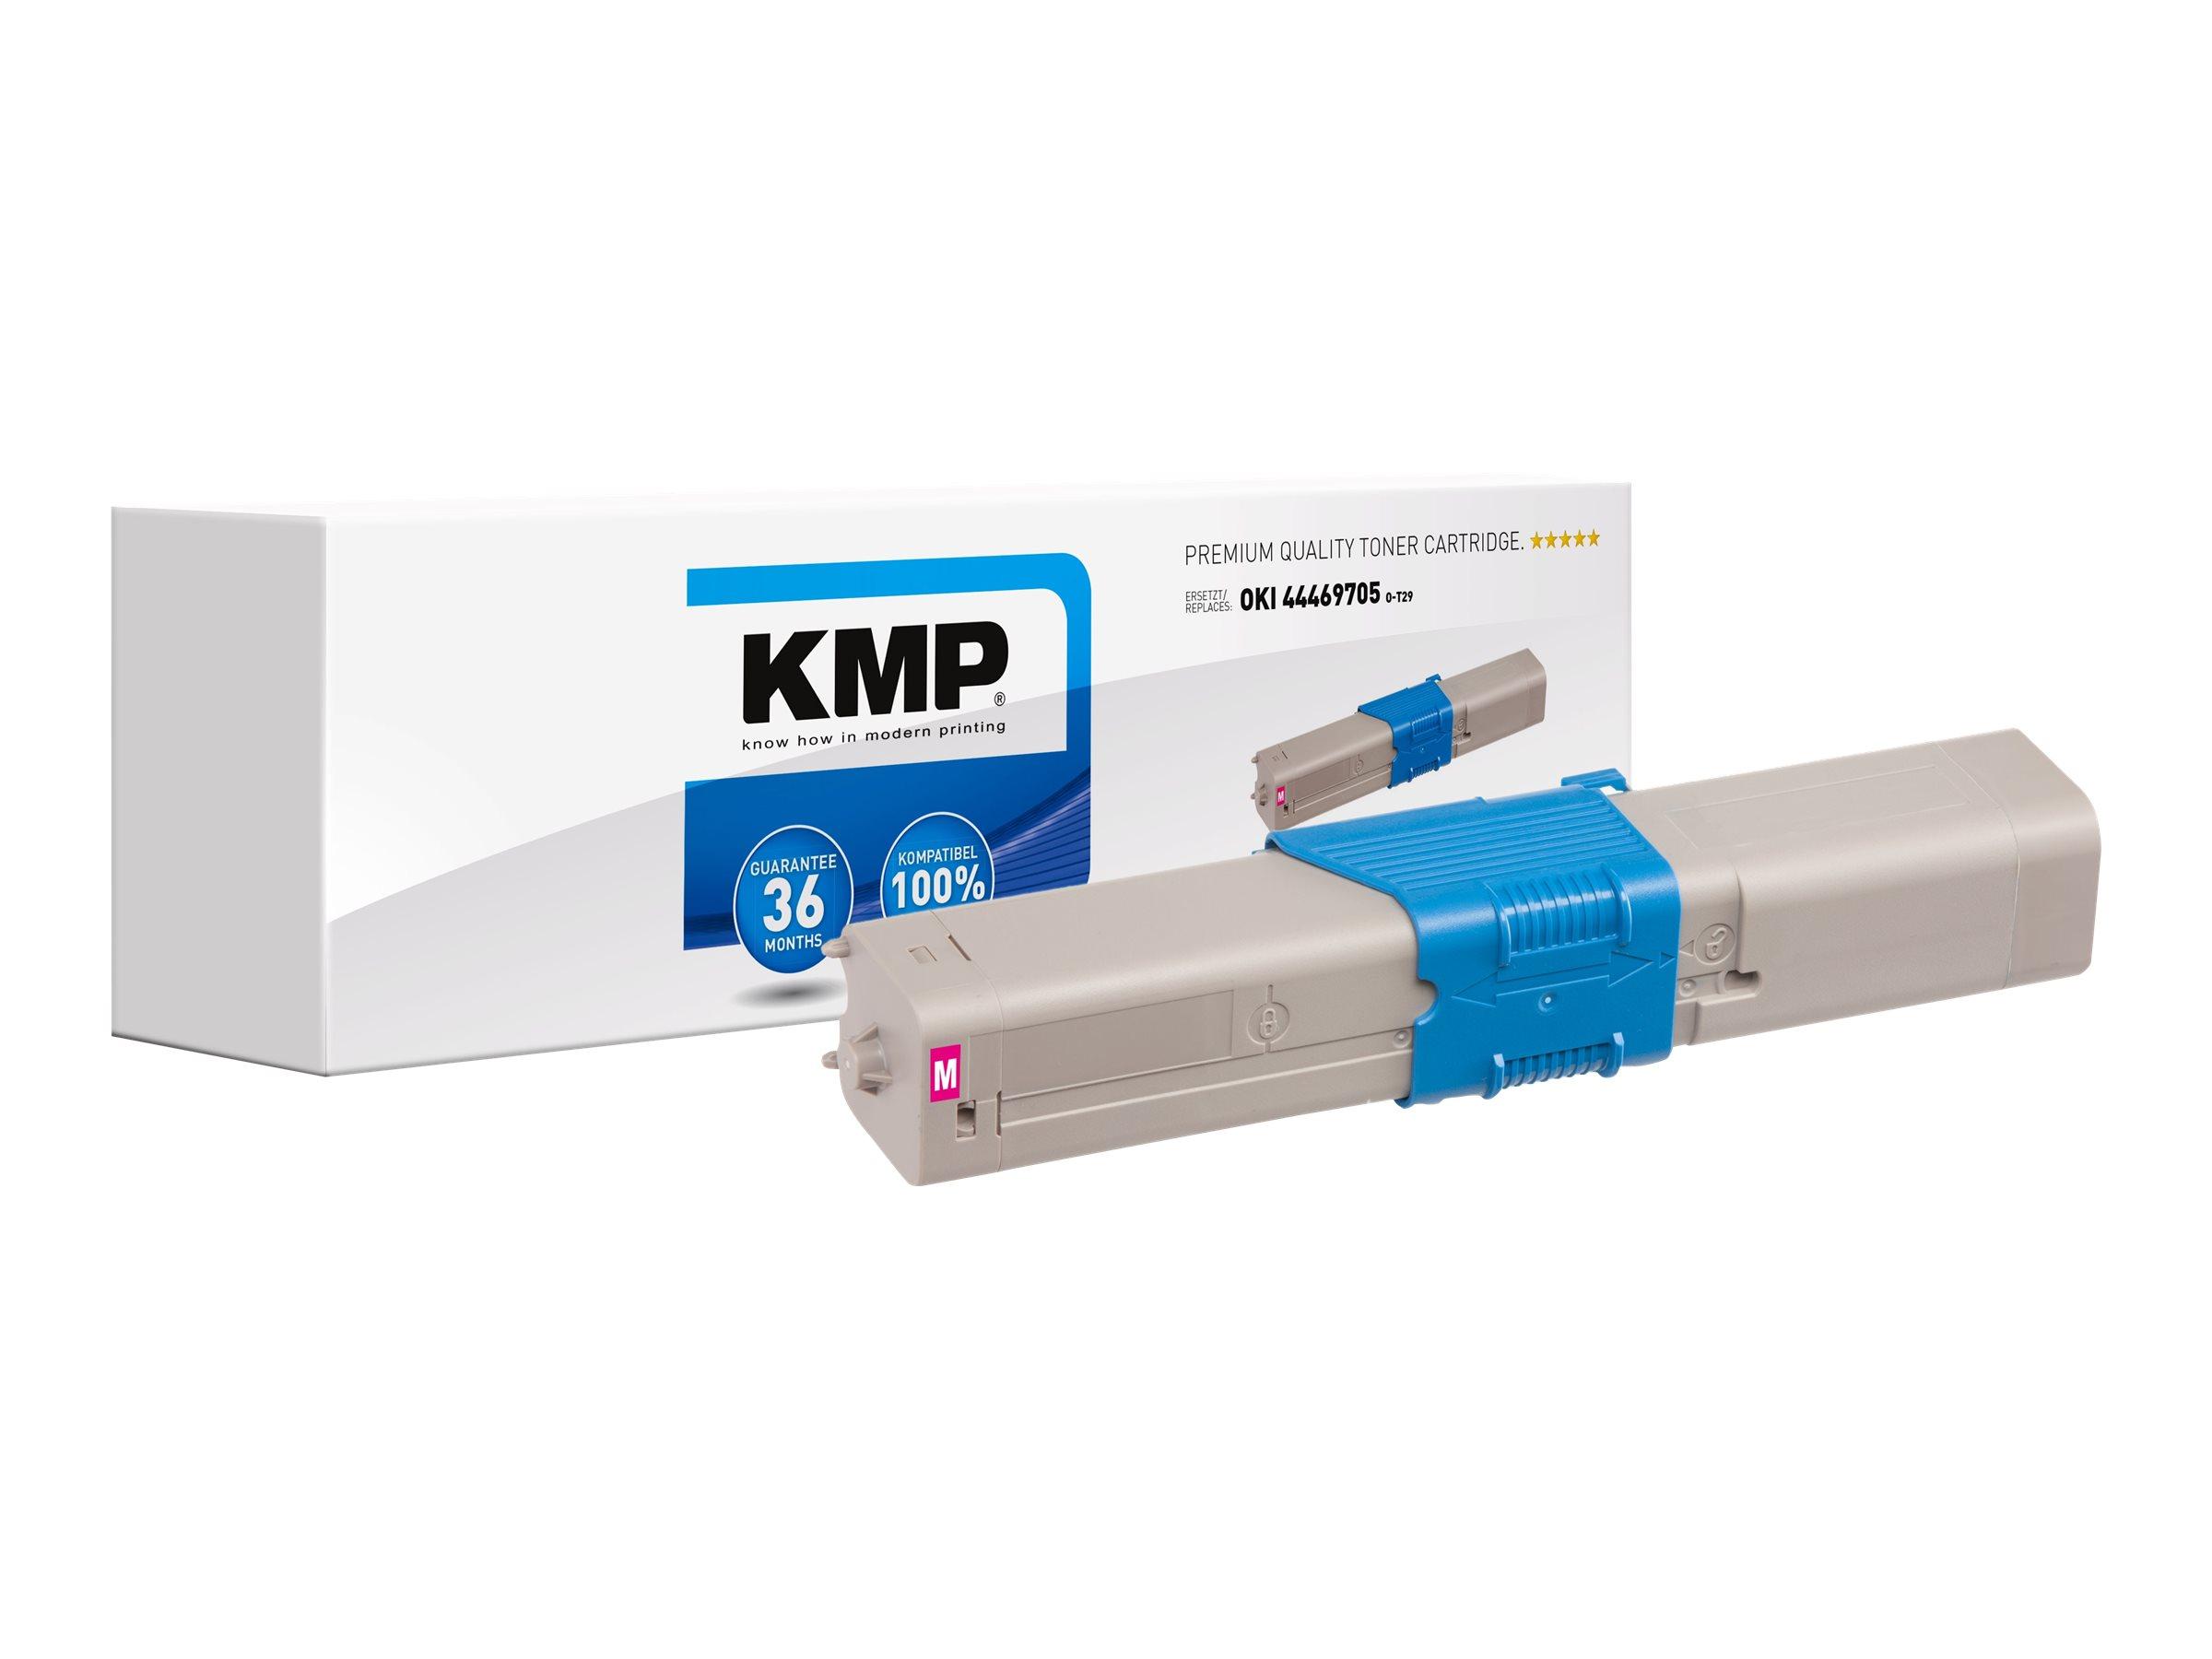 Vorschau: KMP O-T29 - 50 g - Magenta - compatible - Tonerpatrone